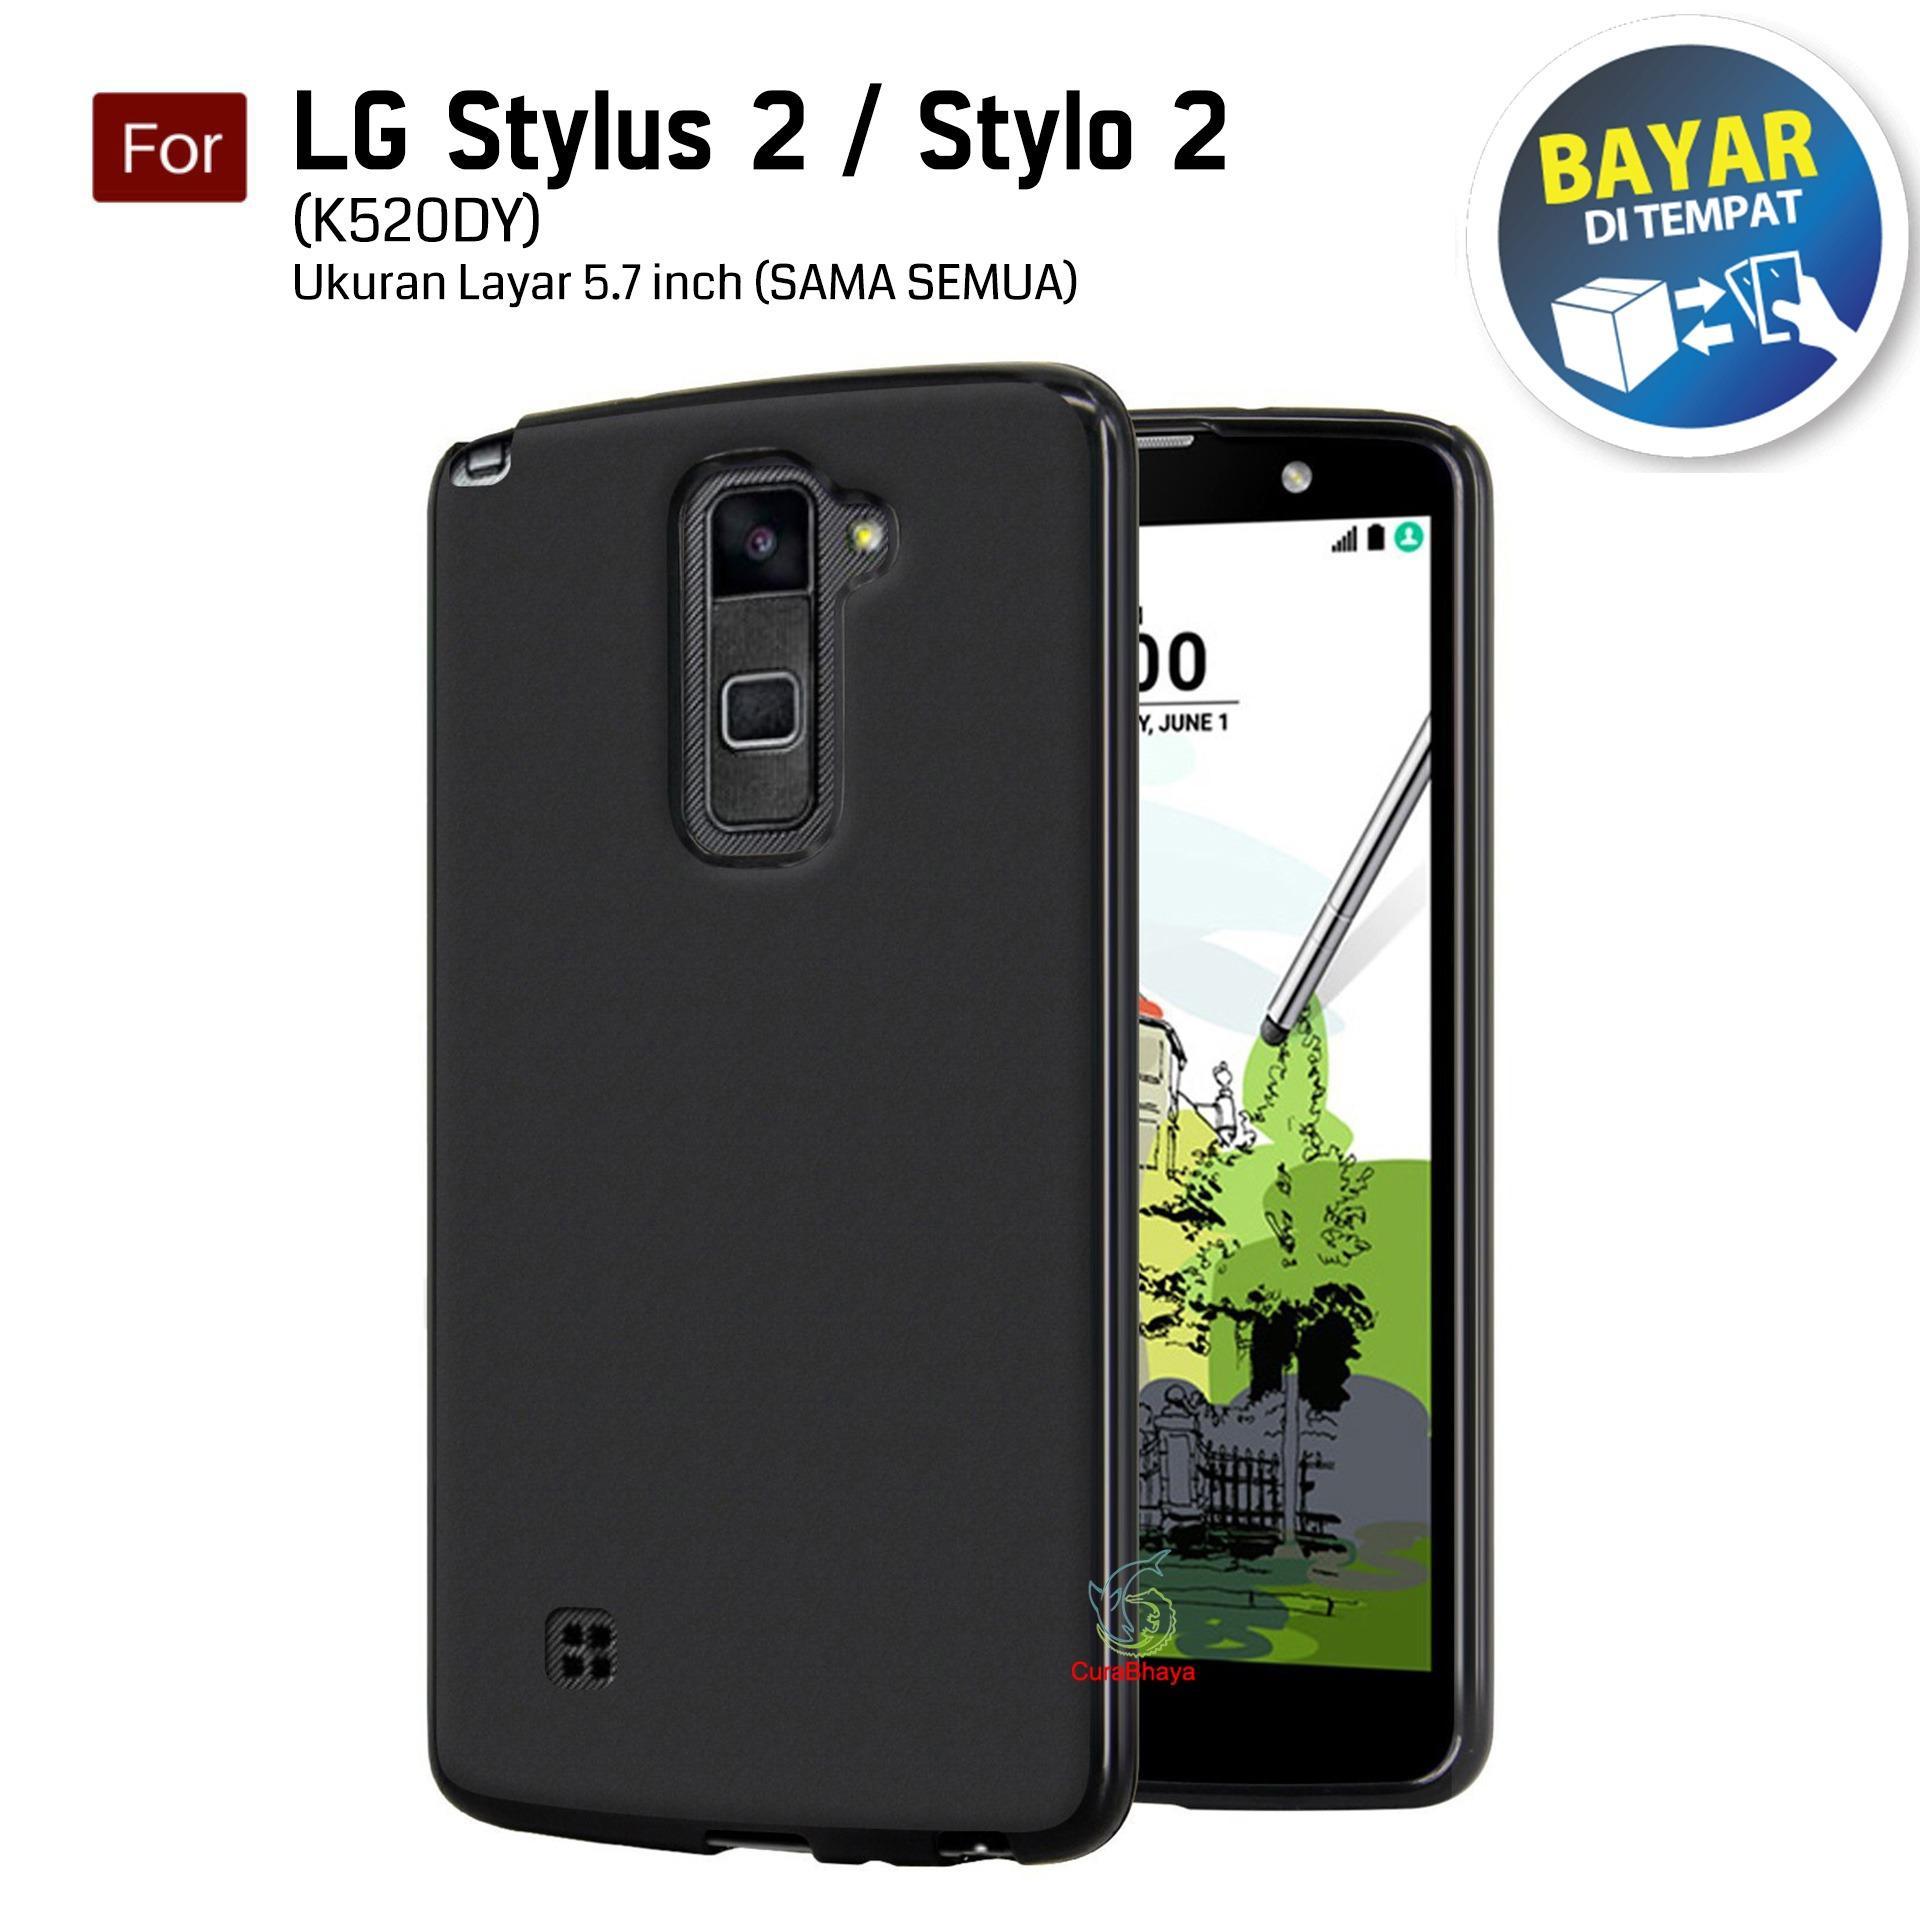 MidNight LG Stylus 2  / Stylo 2 / K520DY / Dual / LTE | Slim Case Black Matte Softcase Premium Baby